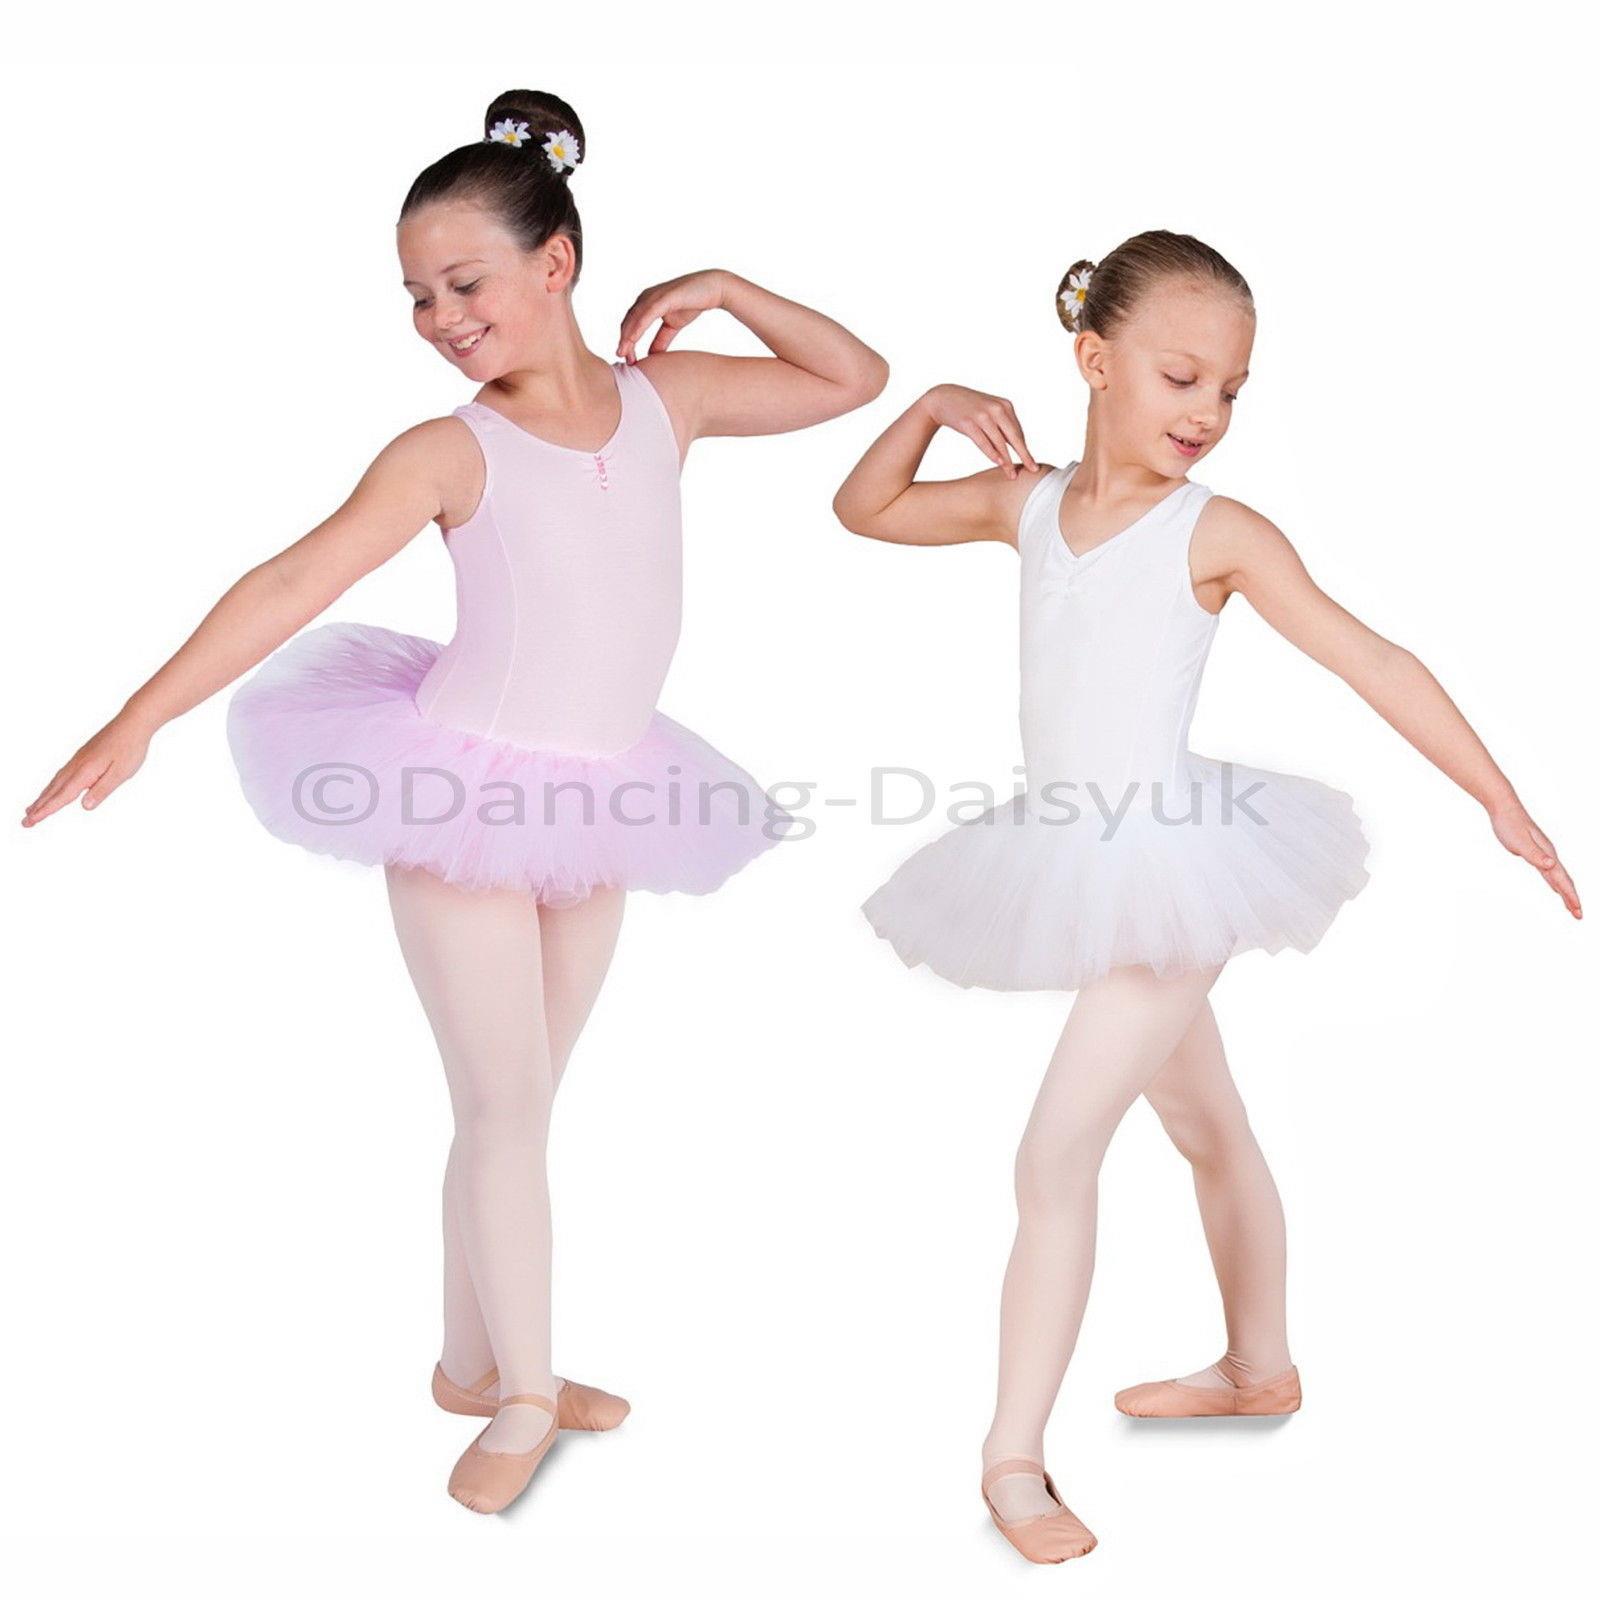 cfc0c5efcd Details about New Lily Girls Ballet Tutu Leotard Ballet Dress Pink White  Age 2-12 yrs